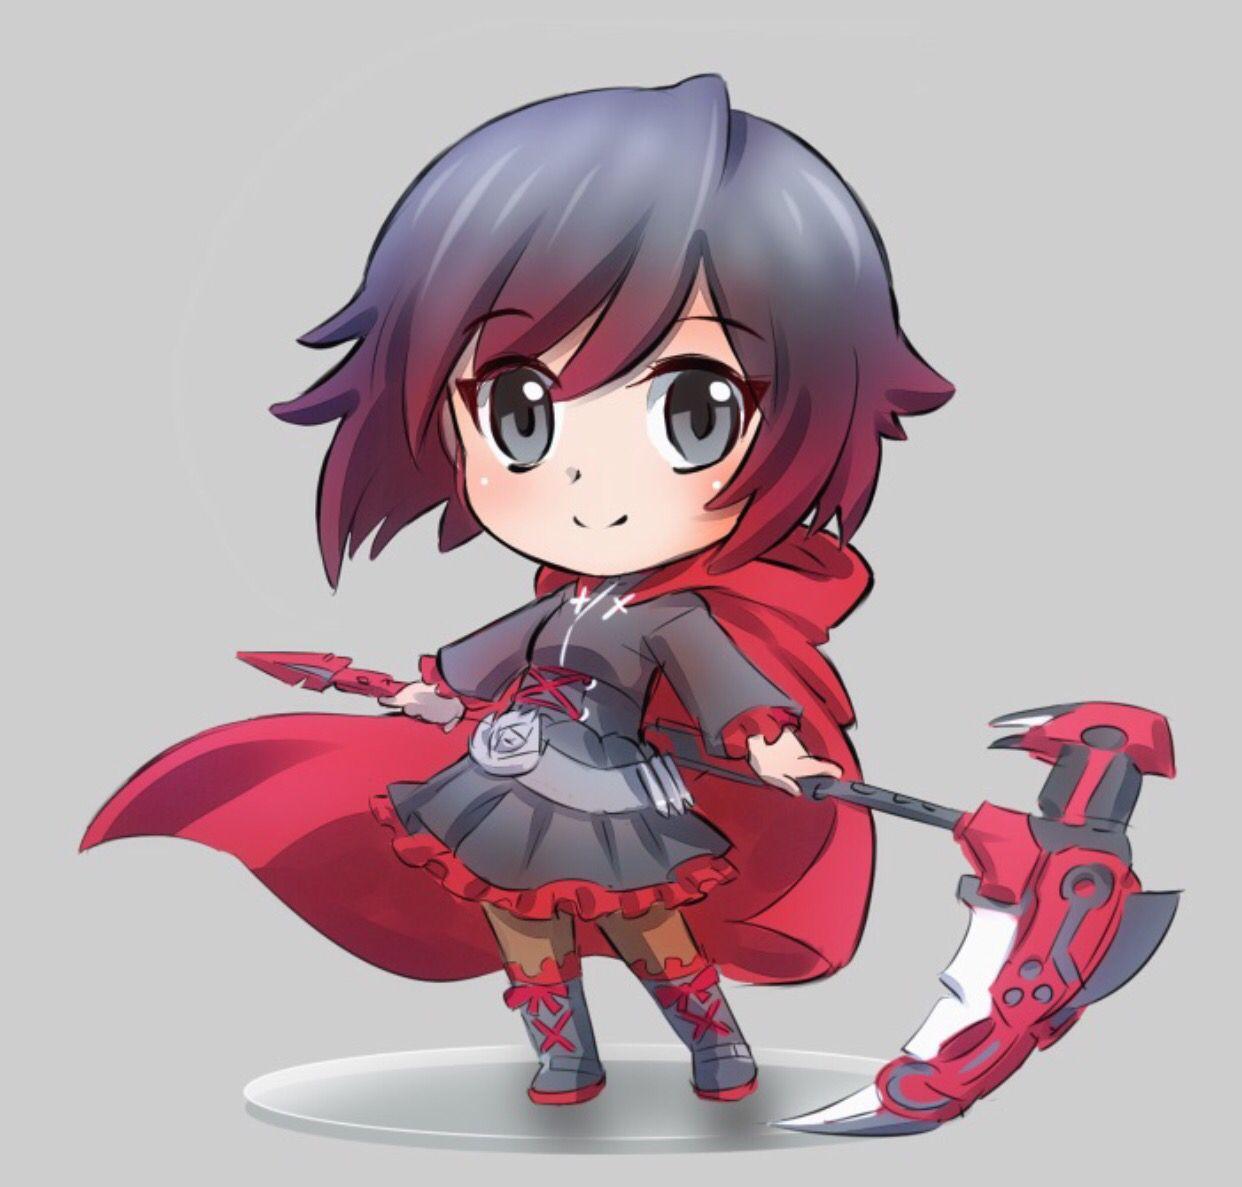 Chibi Ruby | RWBY | Chibi characters, Anime chibi, Rwby